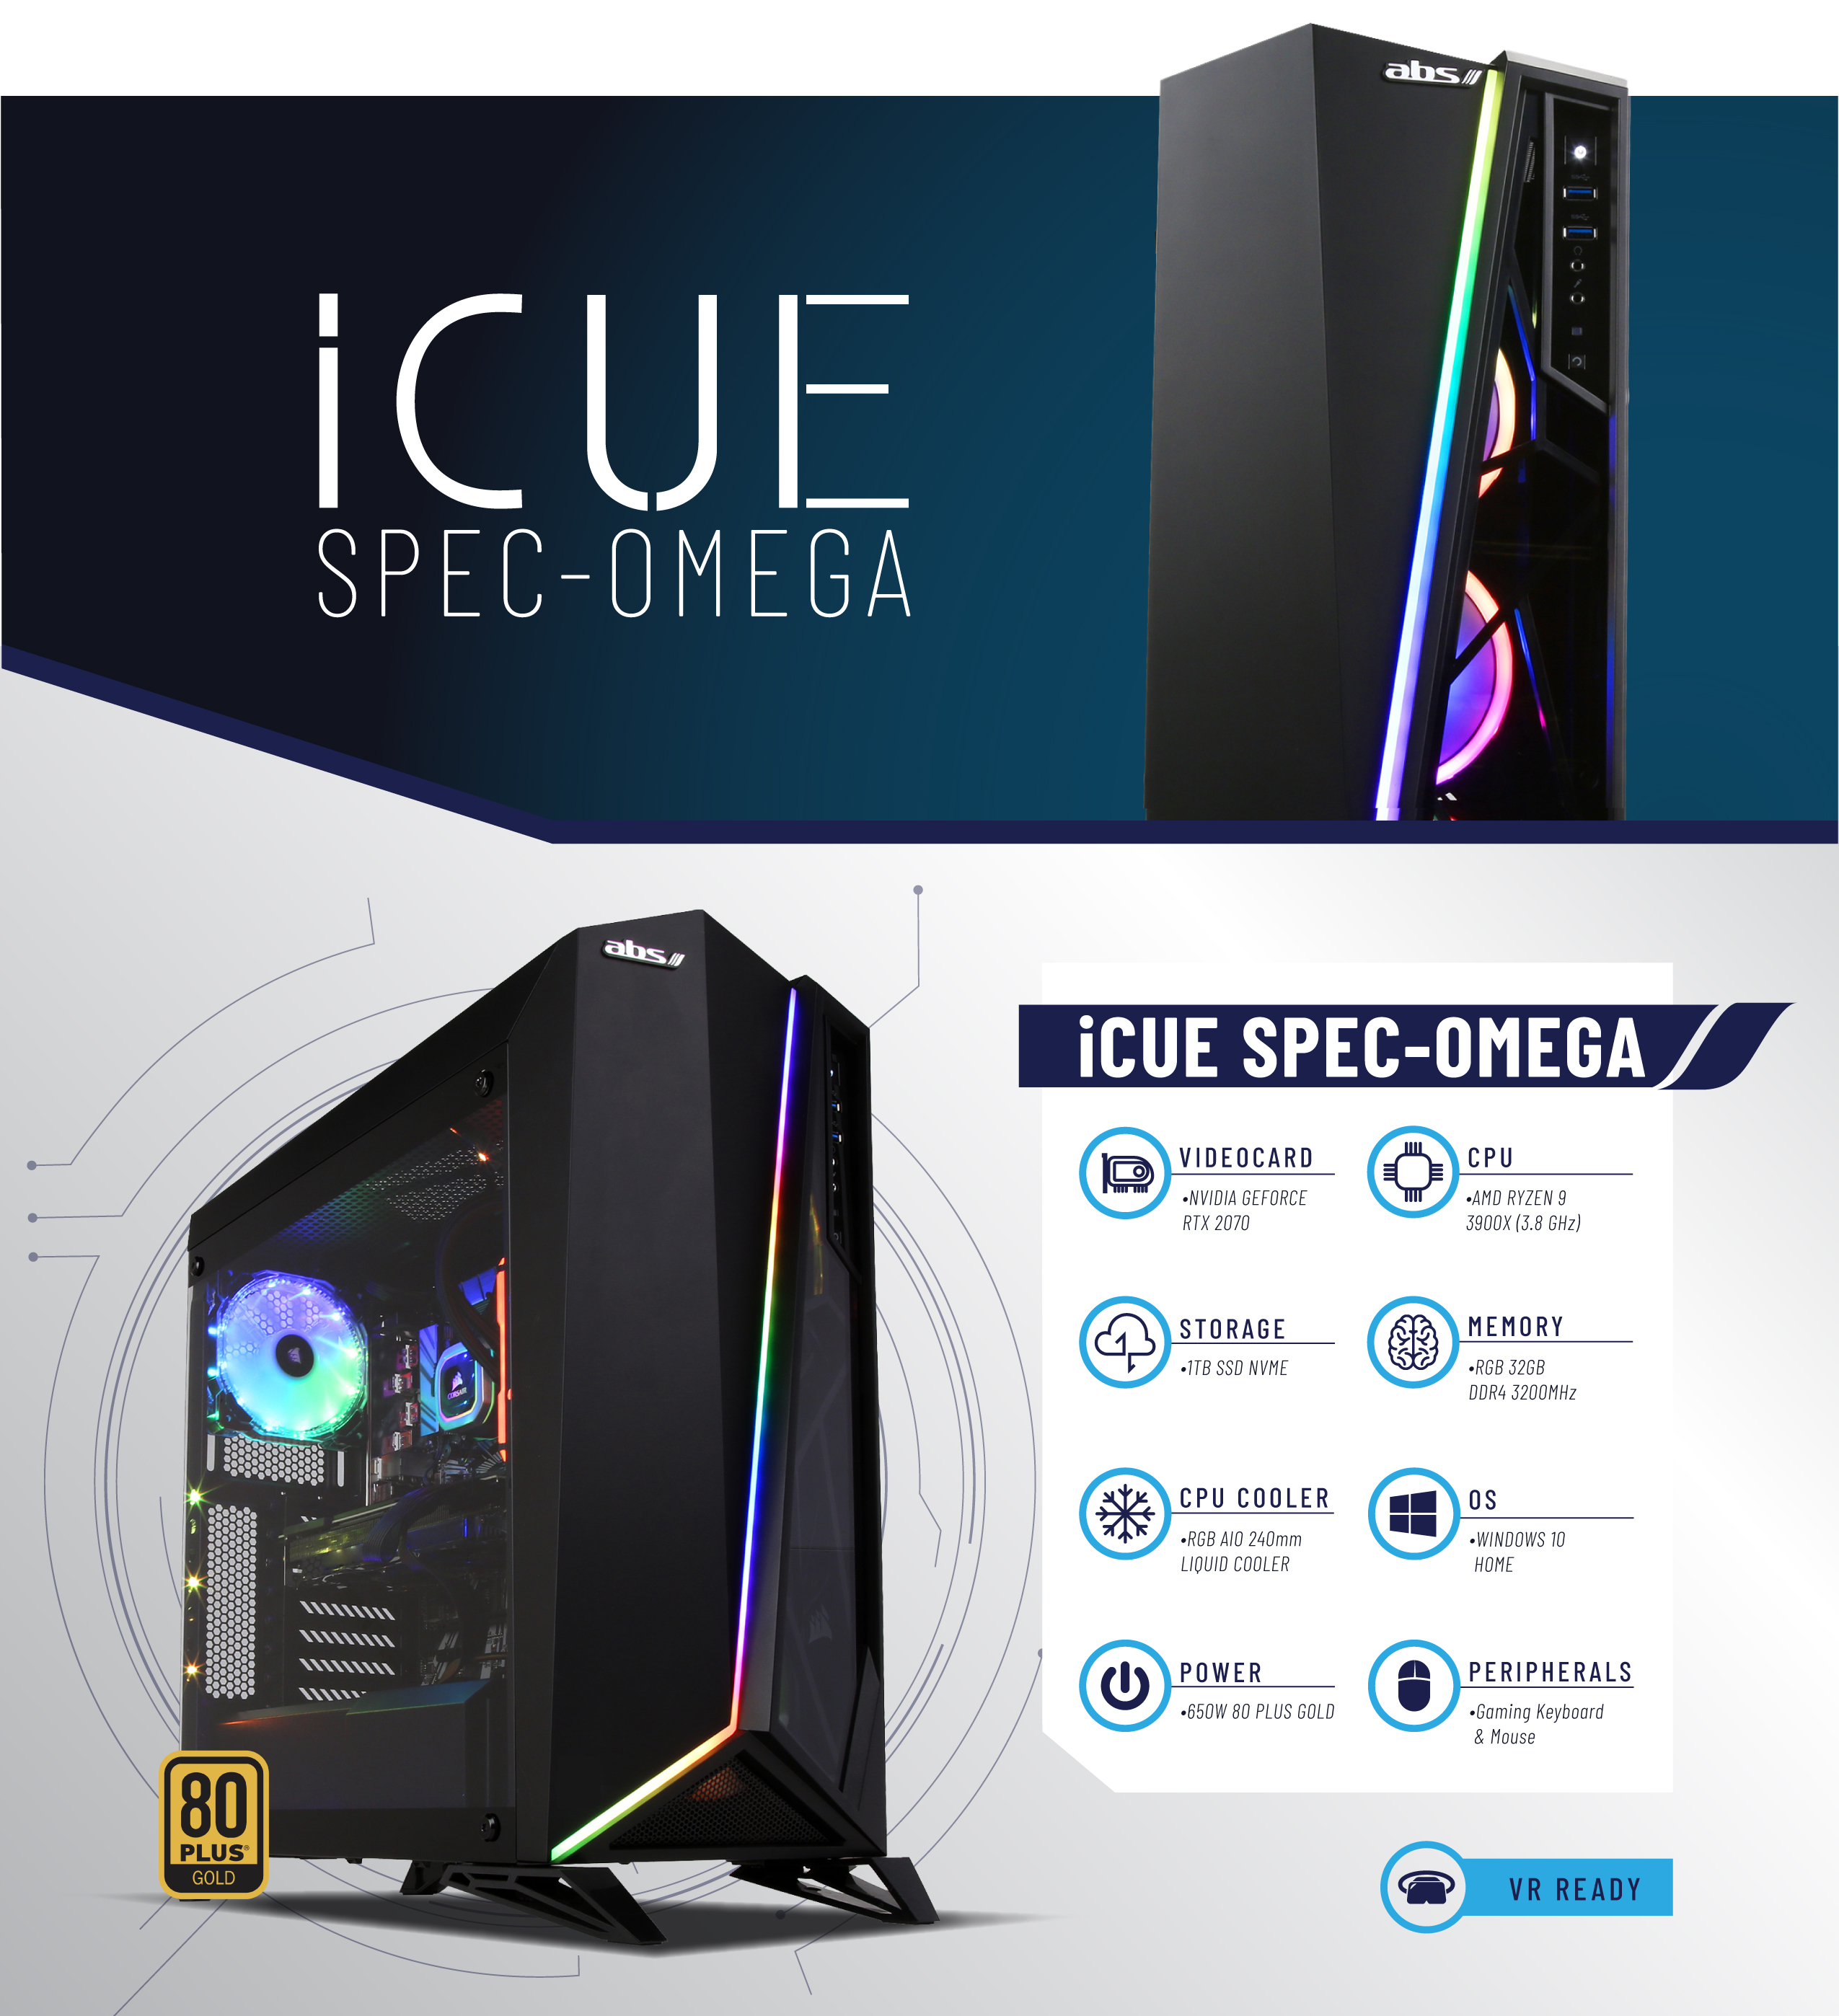 ABS iCue Spec-Omega - RYZEN 9 3900X - GeForce RTX 2070 - 16GB DDR4 3200MHz  - 1TB NVMe SSD - Liquid Cooling (240mm) - Gaming Desktop PC - Newegg com